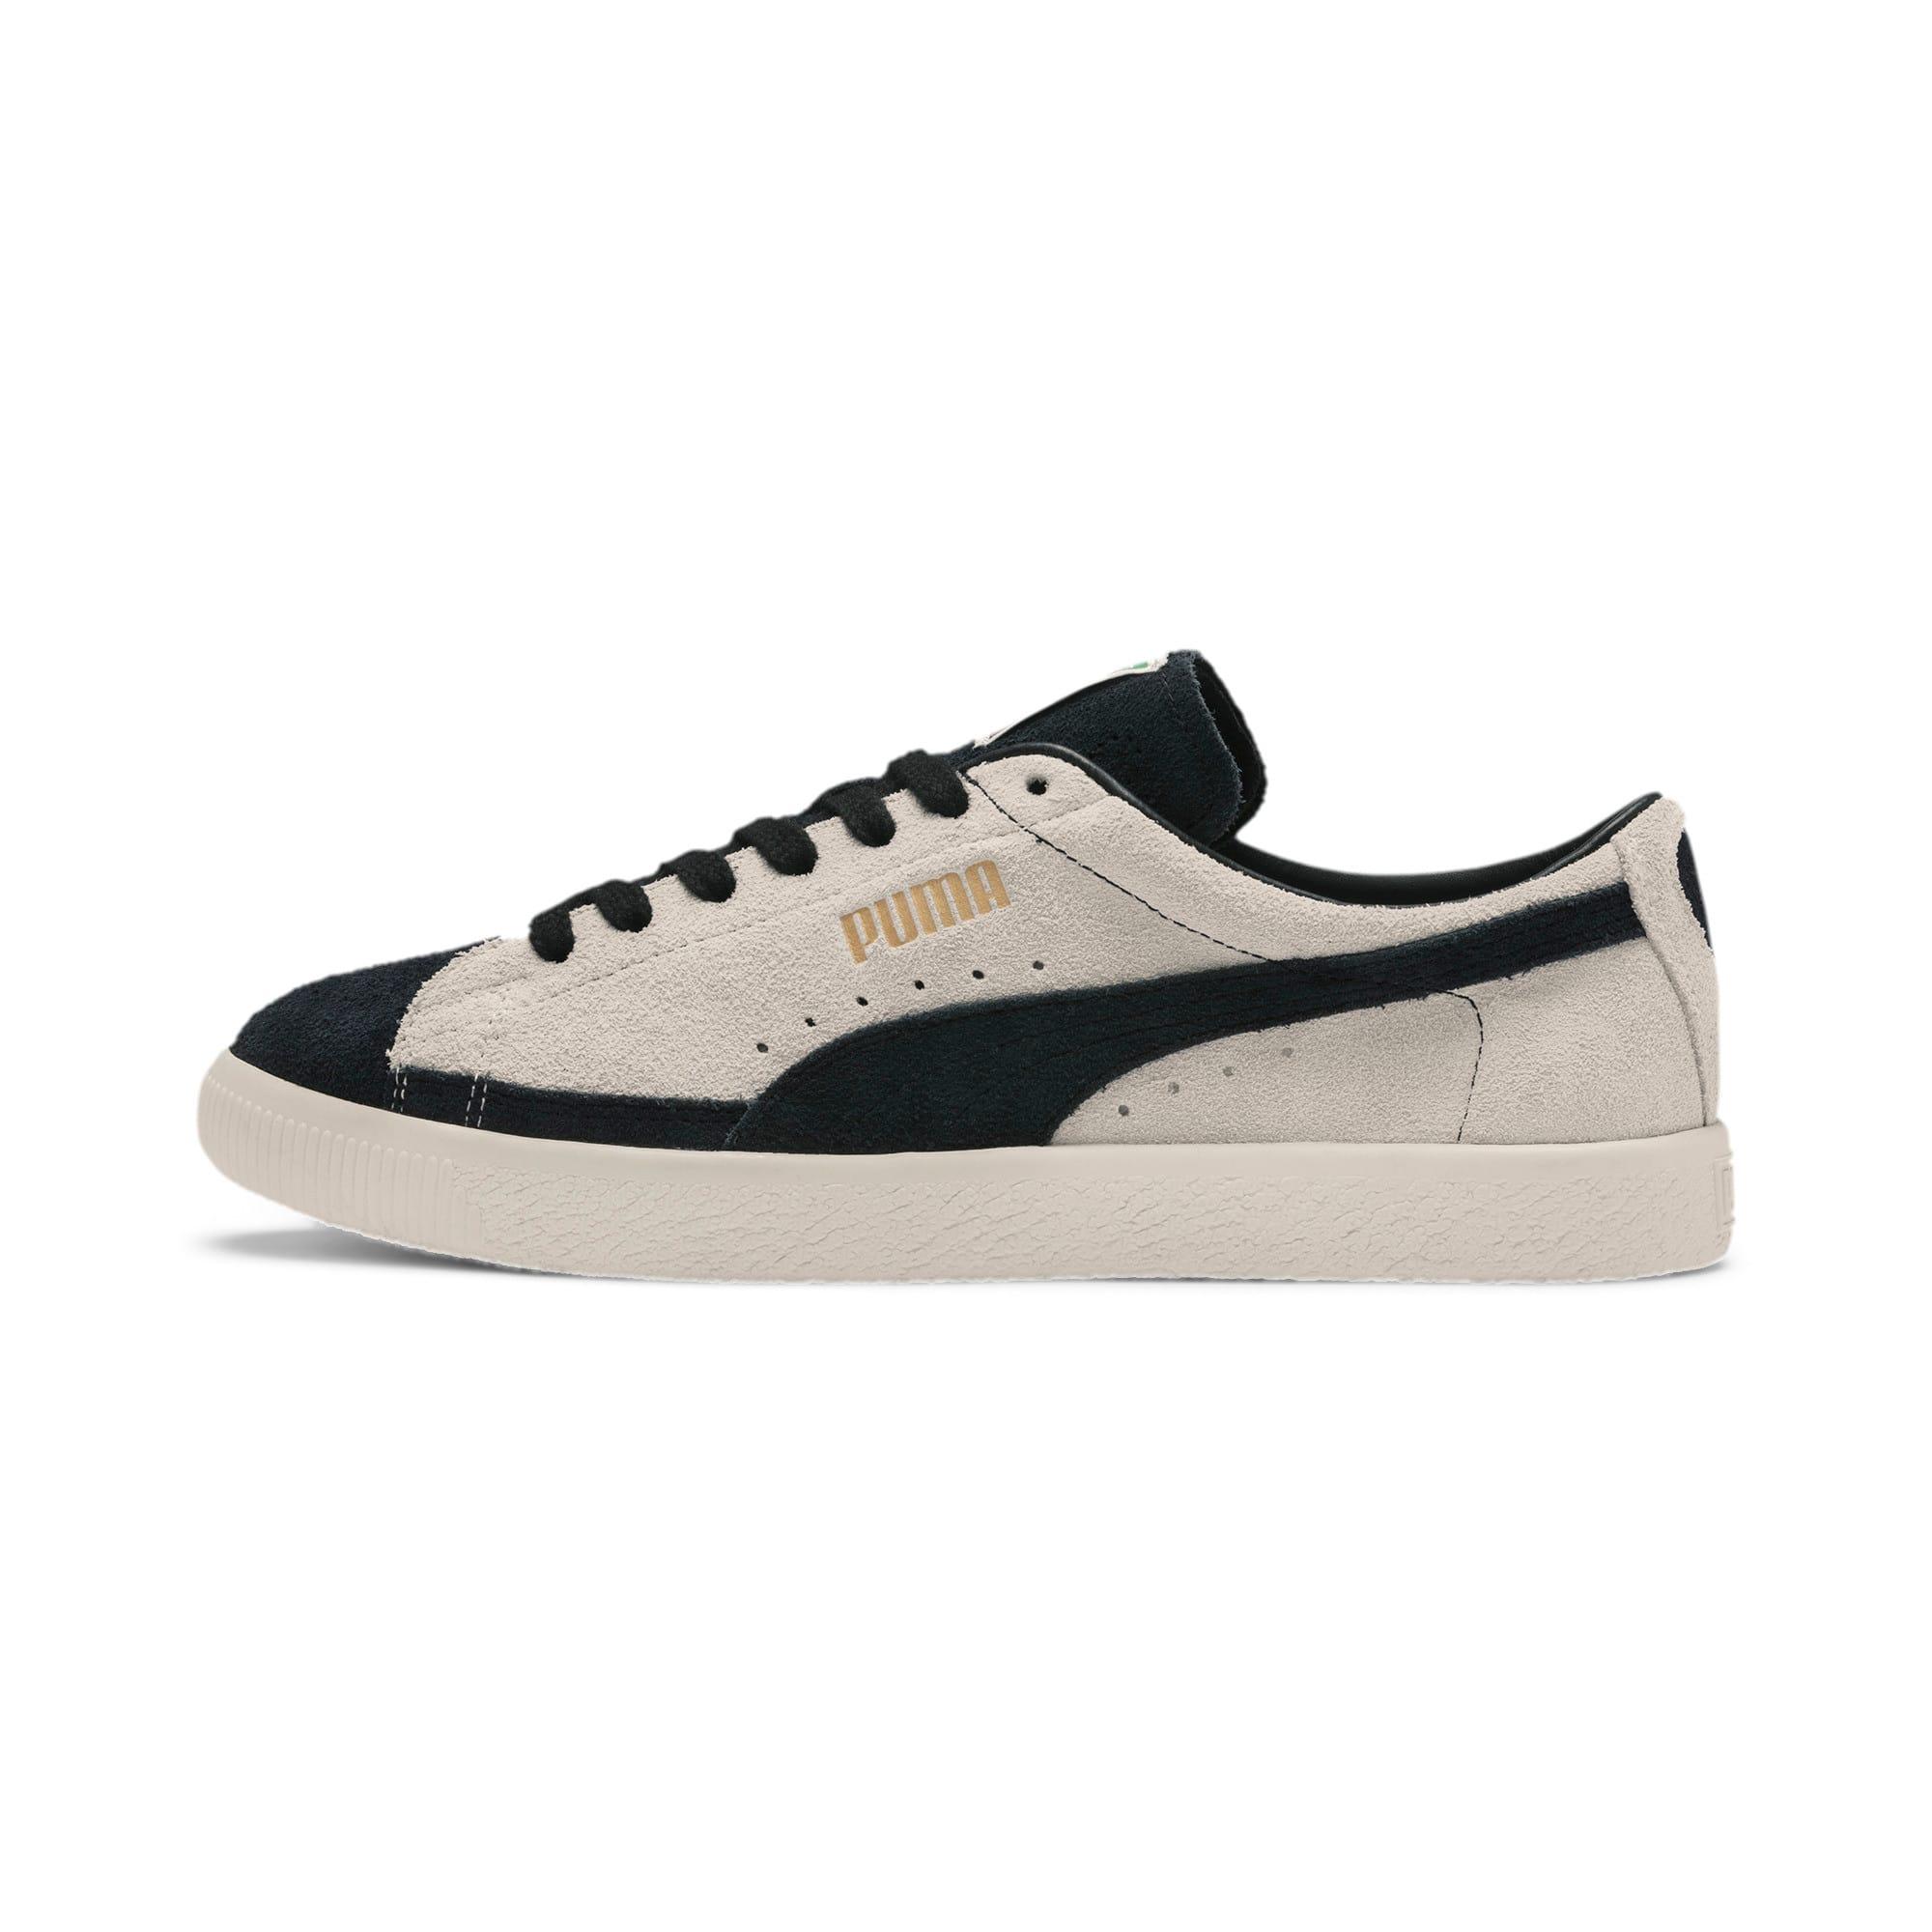 Thumbnail 1 of Suede 90681 Vintage Sneakers, Whisper White-Puma Black, medium